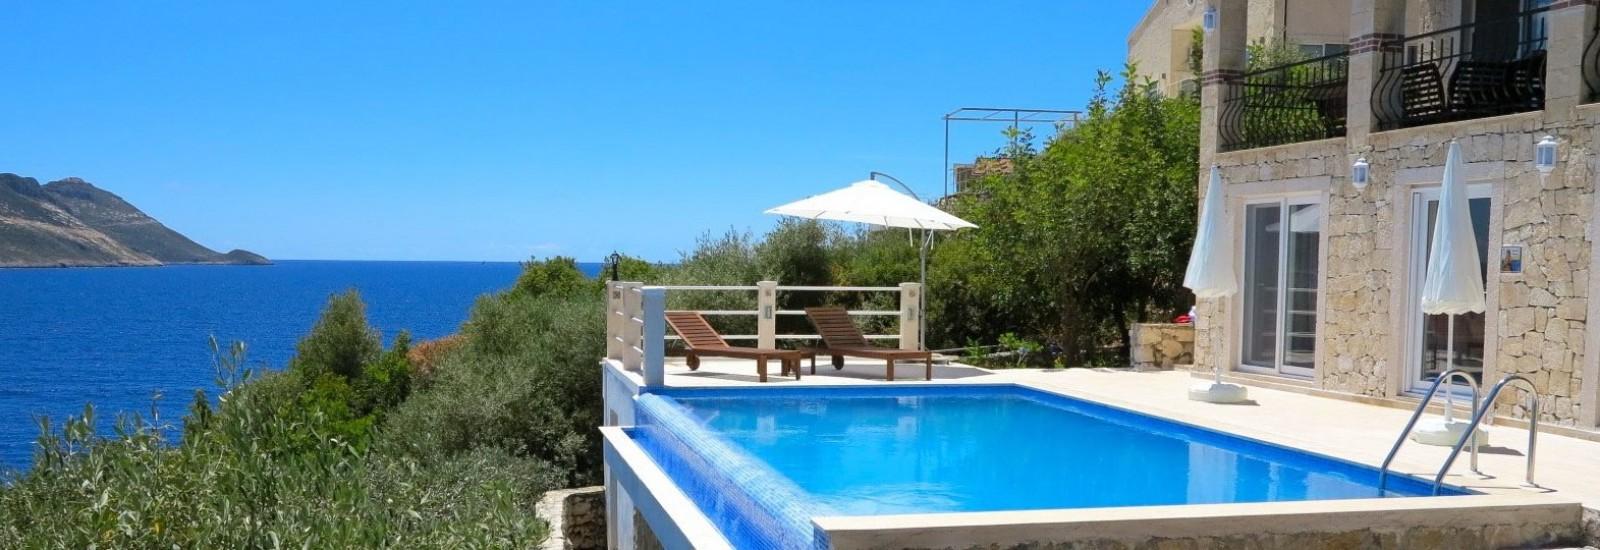 Properties for Sale & Rent - Blue Sky Properties - Real